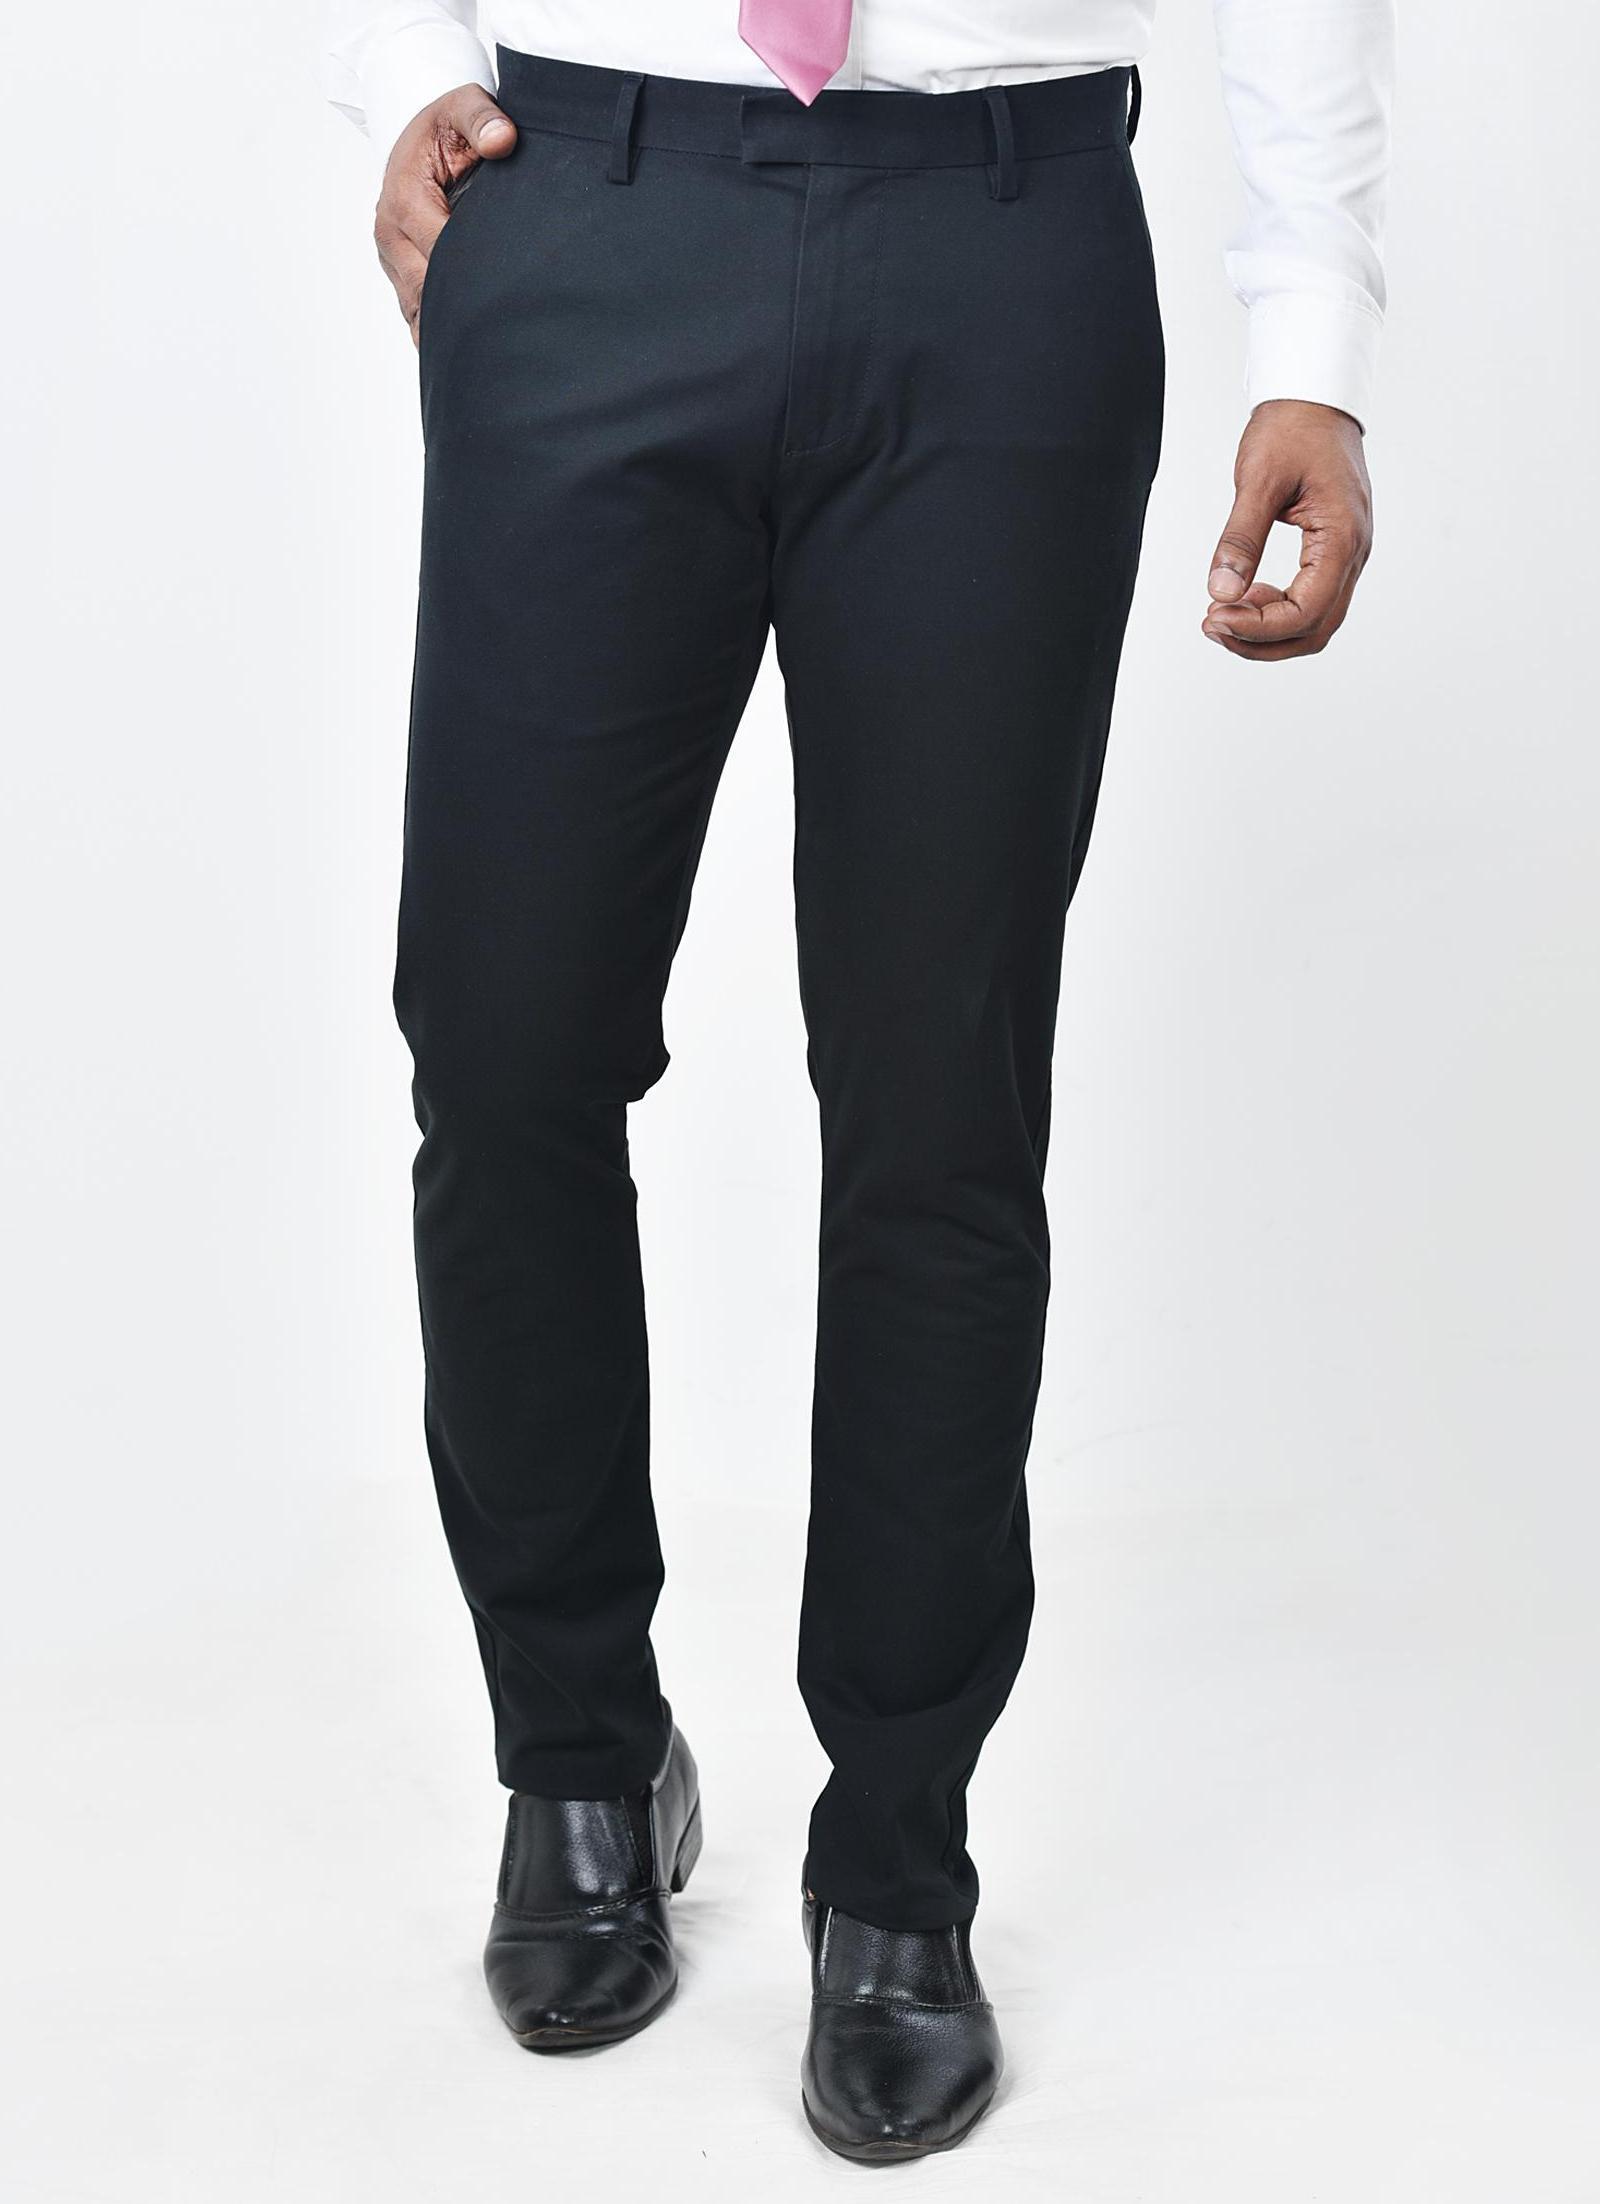 Moose Men's Comfort Chino Pant - Black